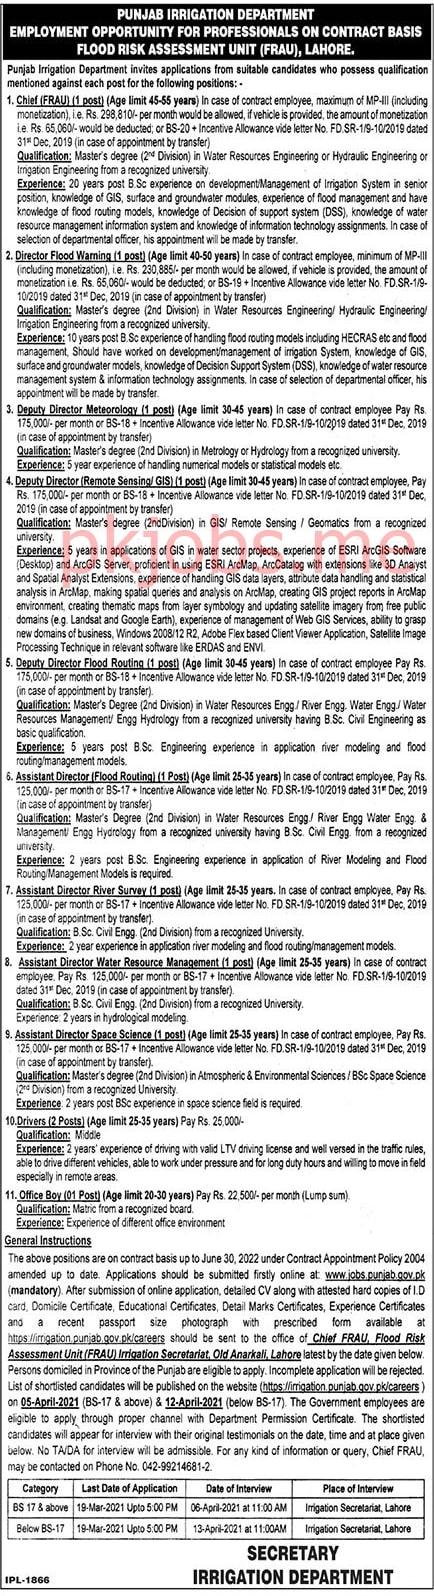 Latest Punjab Irrigation Department Management Posts 2021